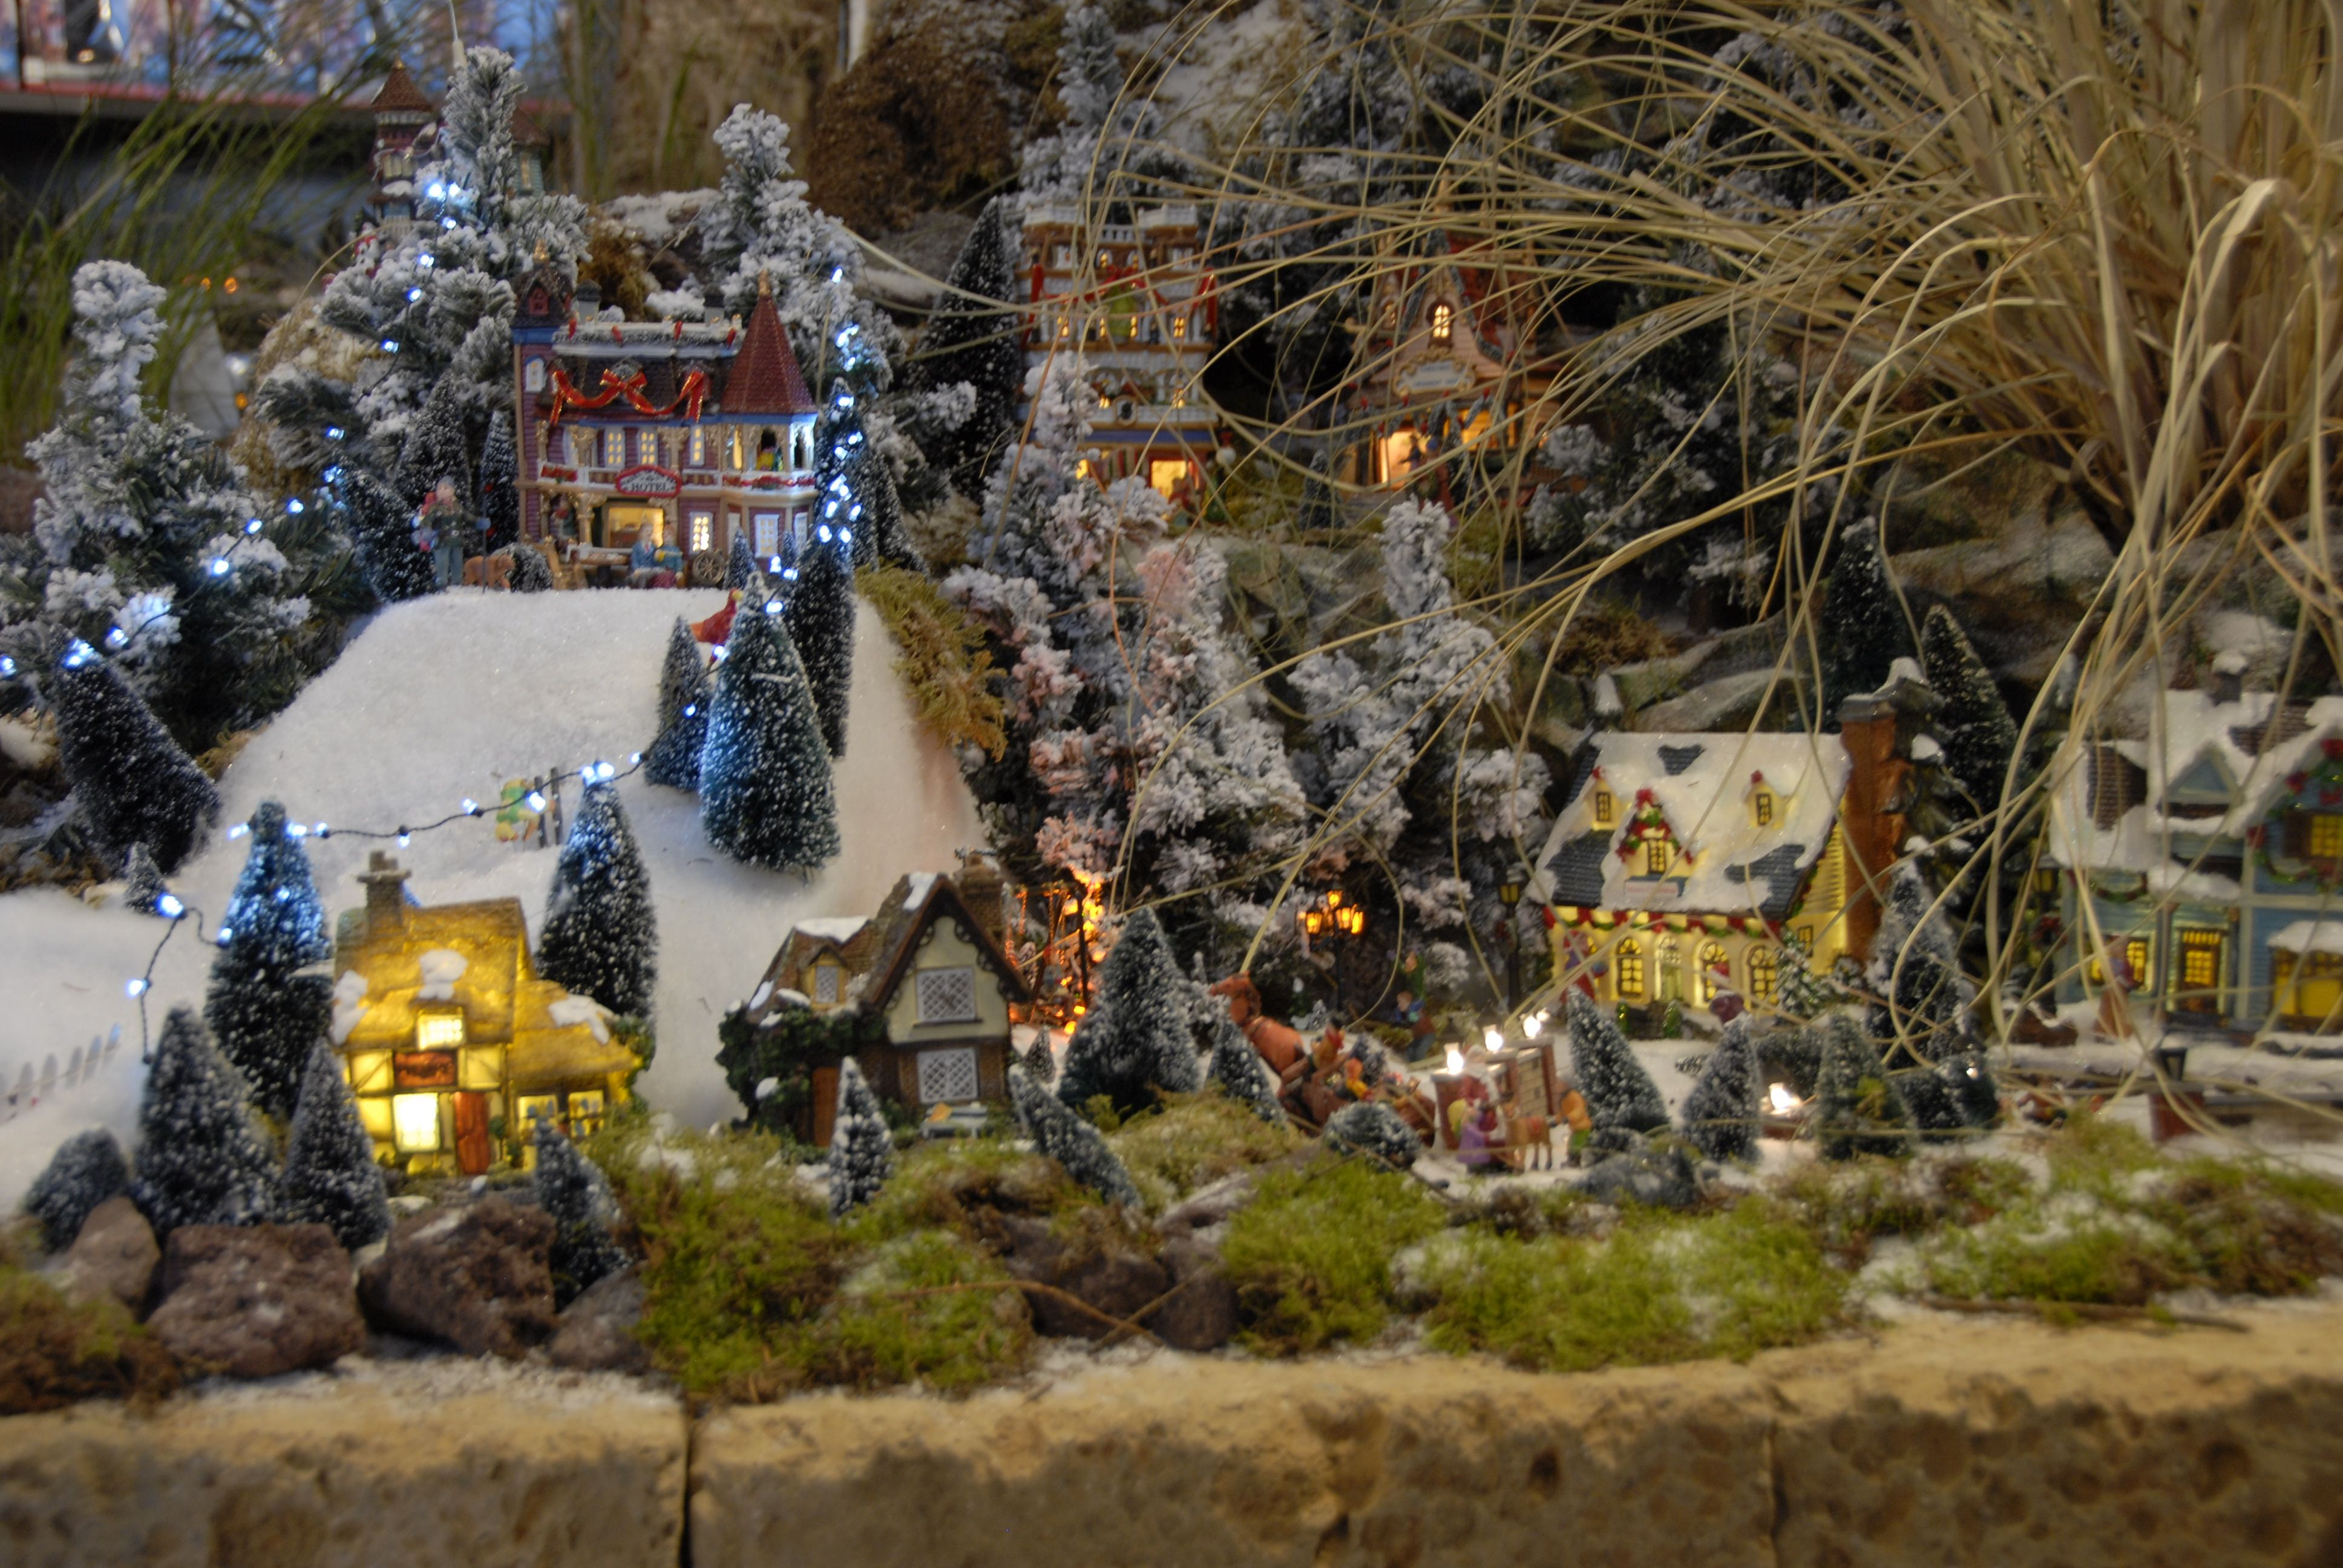 Lemax kerstdorp intratuin 39 s gravenzande november 2013 for Intratuin s gravenzande